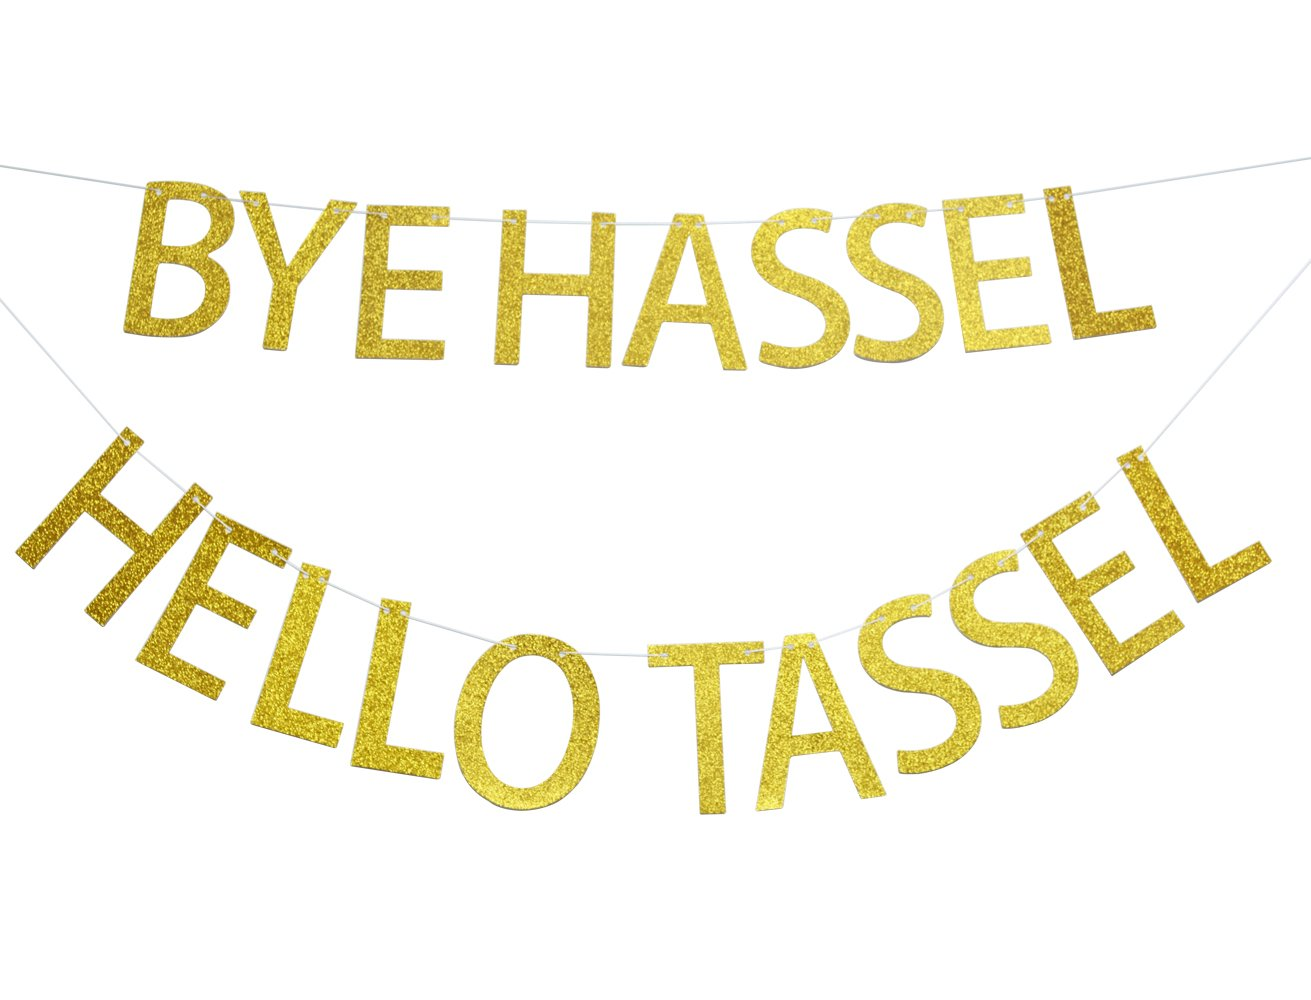 Bye Hassle Hello Tassel Gold Glitter Banner Graduation Sign Photo Props Graduate Party Decorations High School Graduation College Grad Decor (Gold)